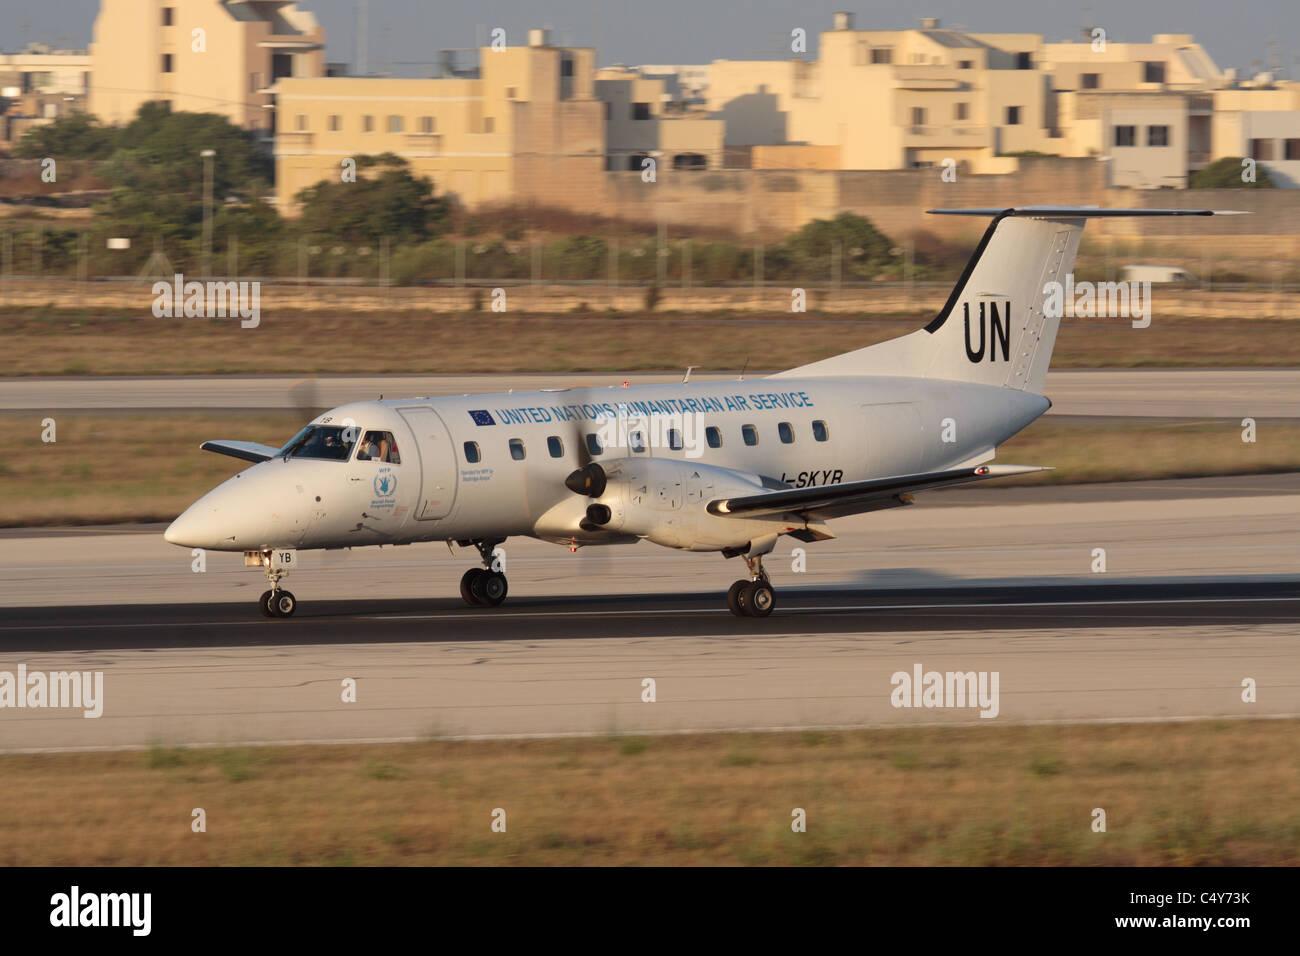 Embraer EMB 120 Brasilia of the United Nations landing in Malta during humanitarian operations in Libya, 19 June - Stock Image